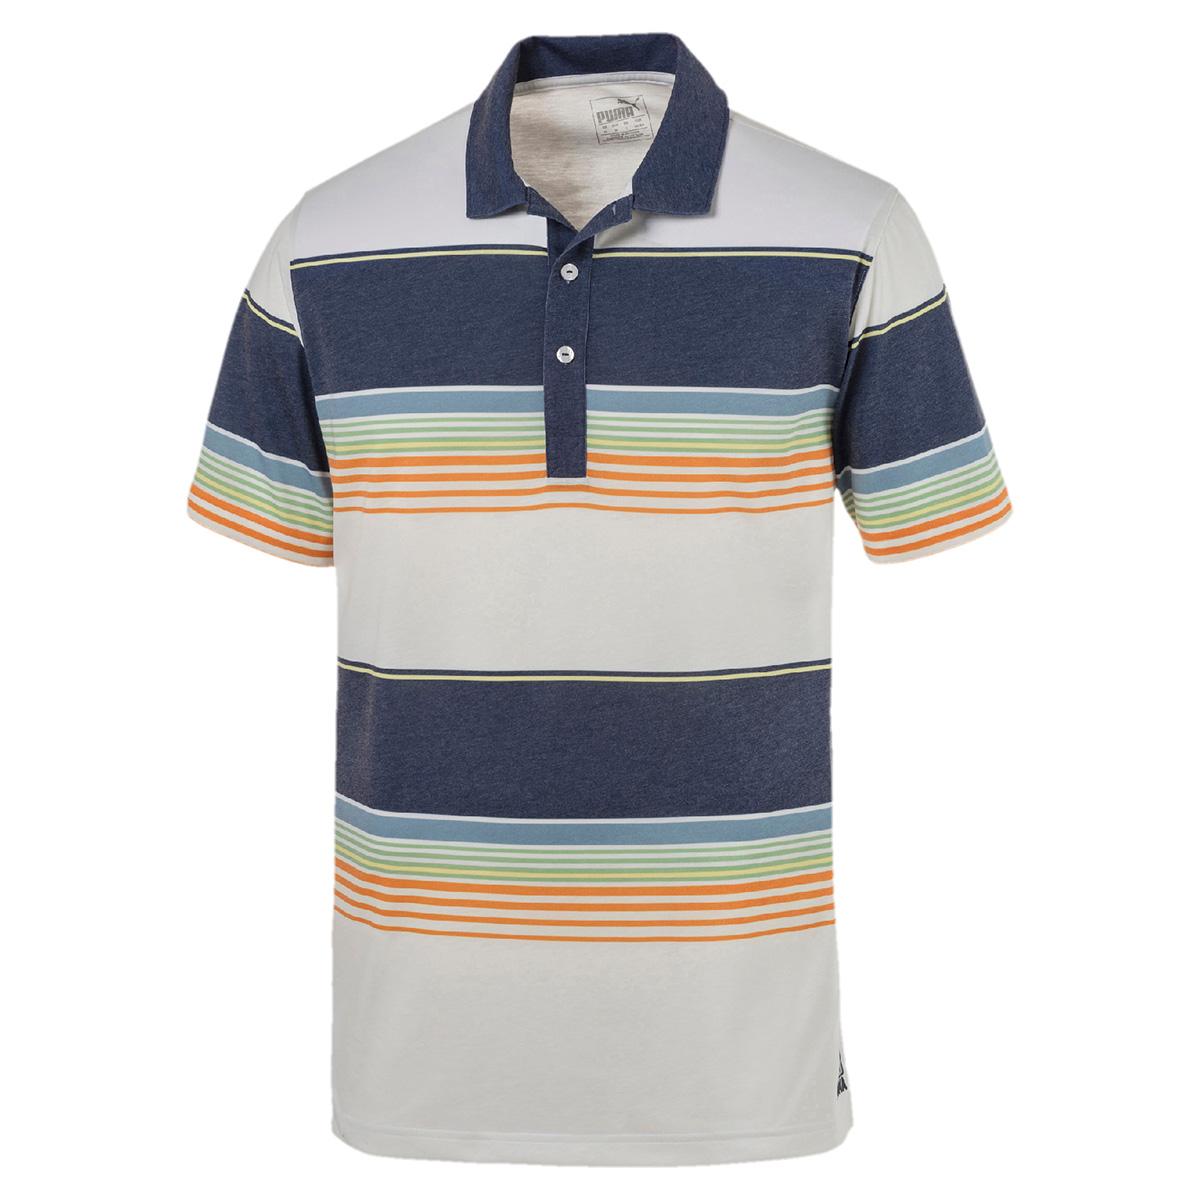 【Play Loose Collection】パイプライン 半袖ポロシャツ